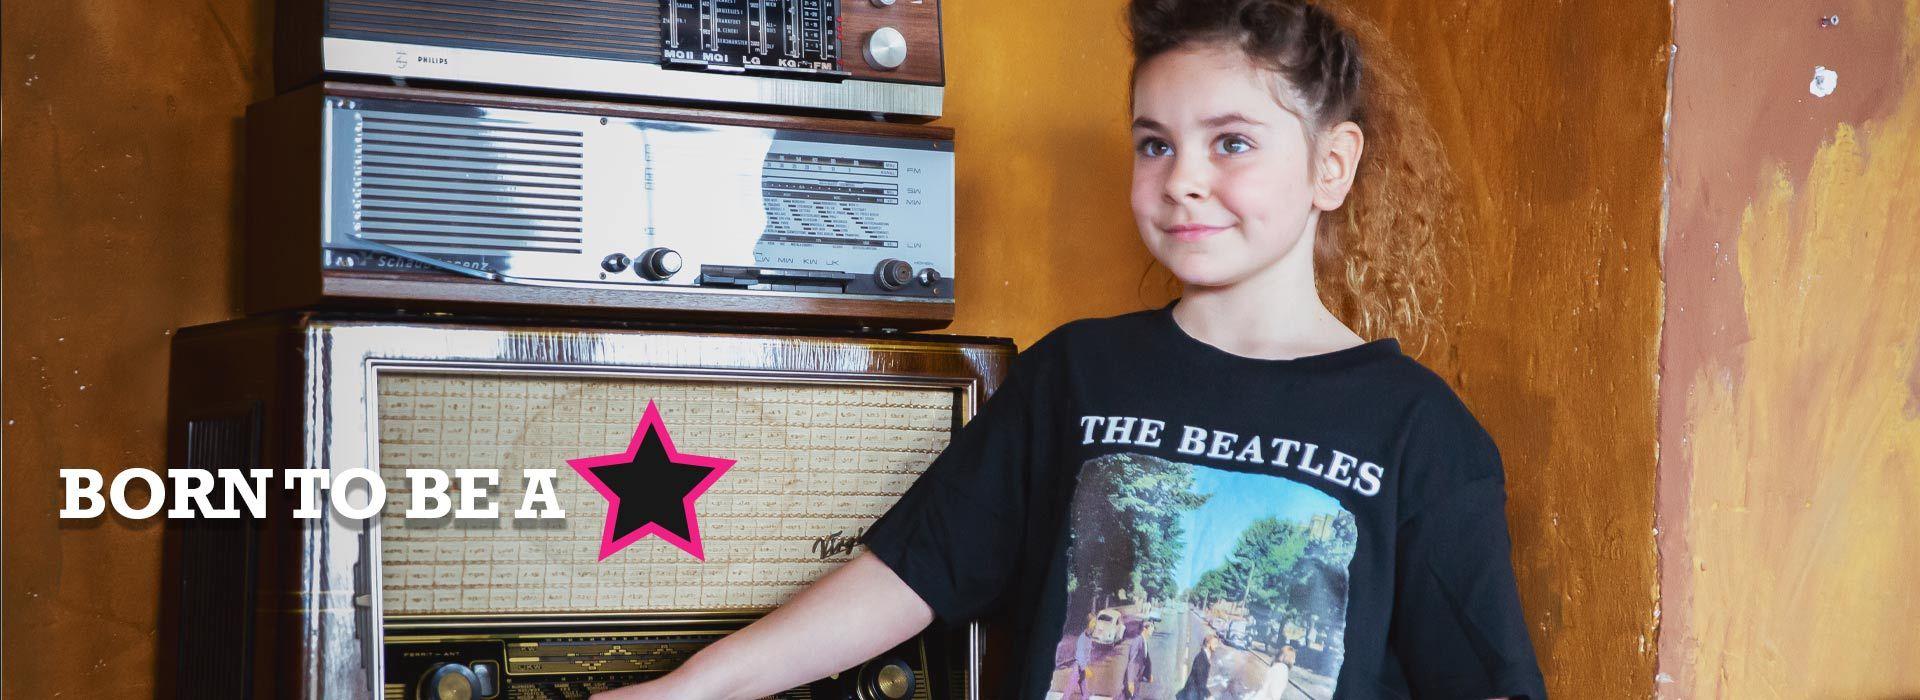 Rock kinder kleding - The Beatles Abbey Road T-shirt